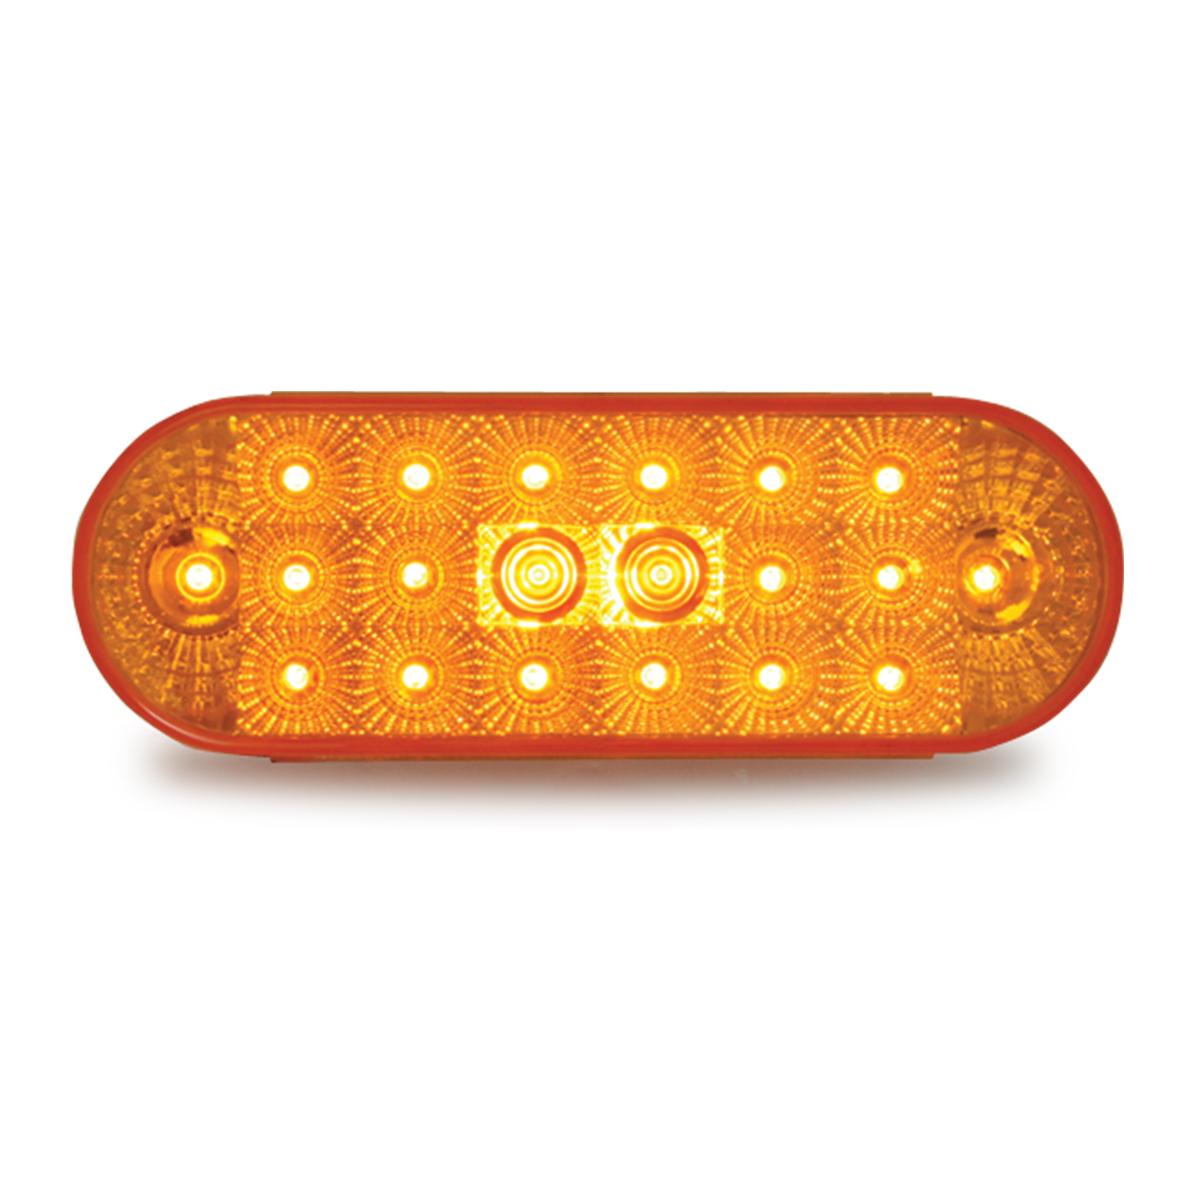 77050 Oval Spyder LED Light in Amber/Amber